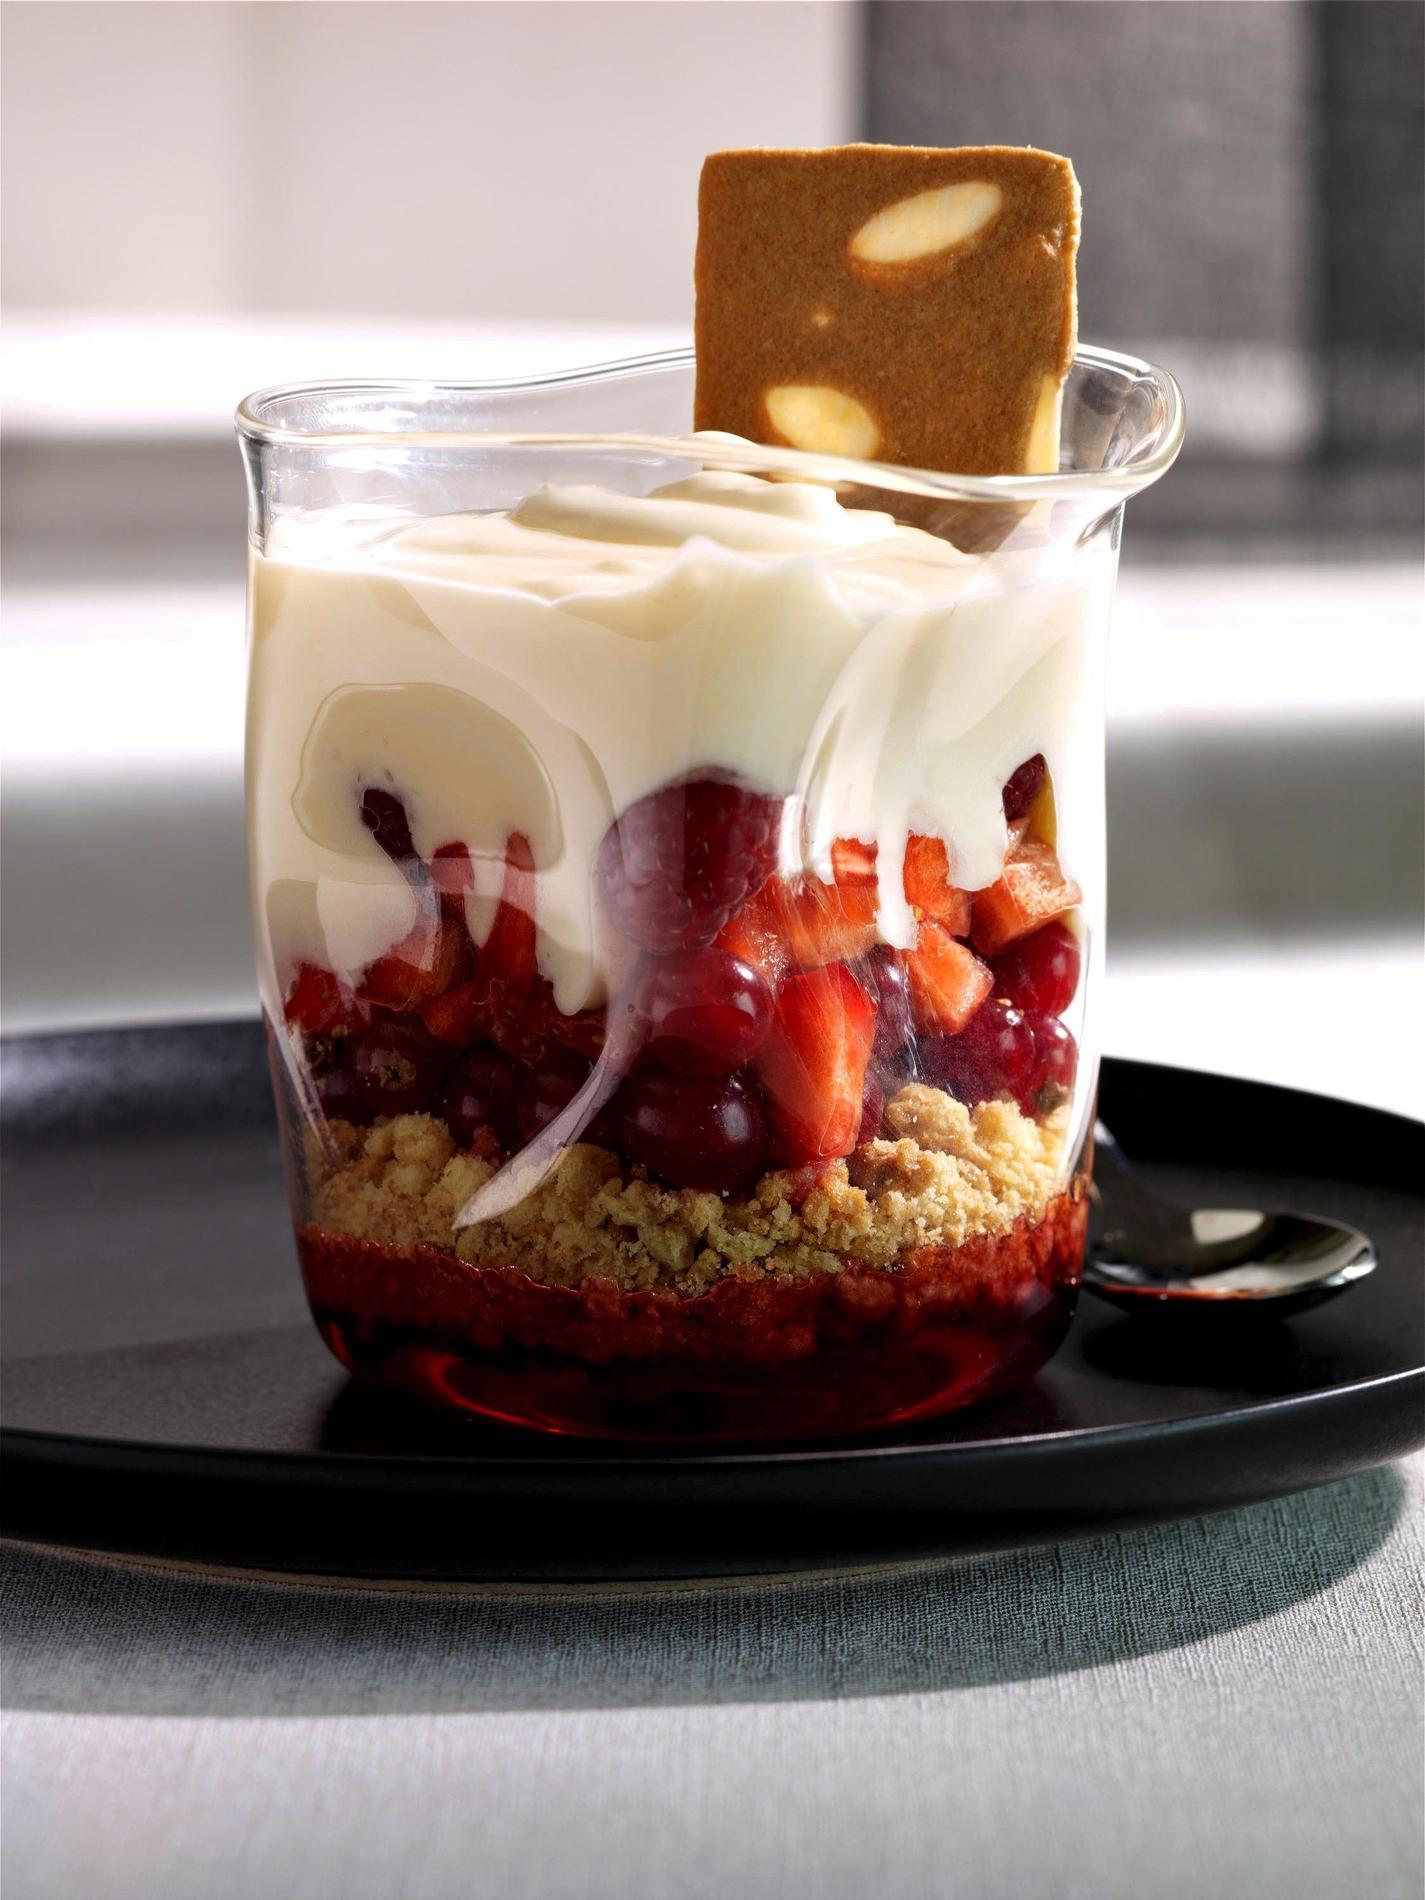 recette tiramisu fruits rouges vanille cuisine madame figaro. Black Bedroom Furniture Sets. Home Design Ideas